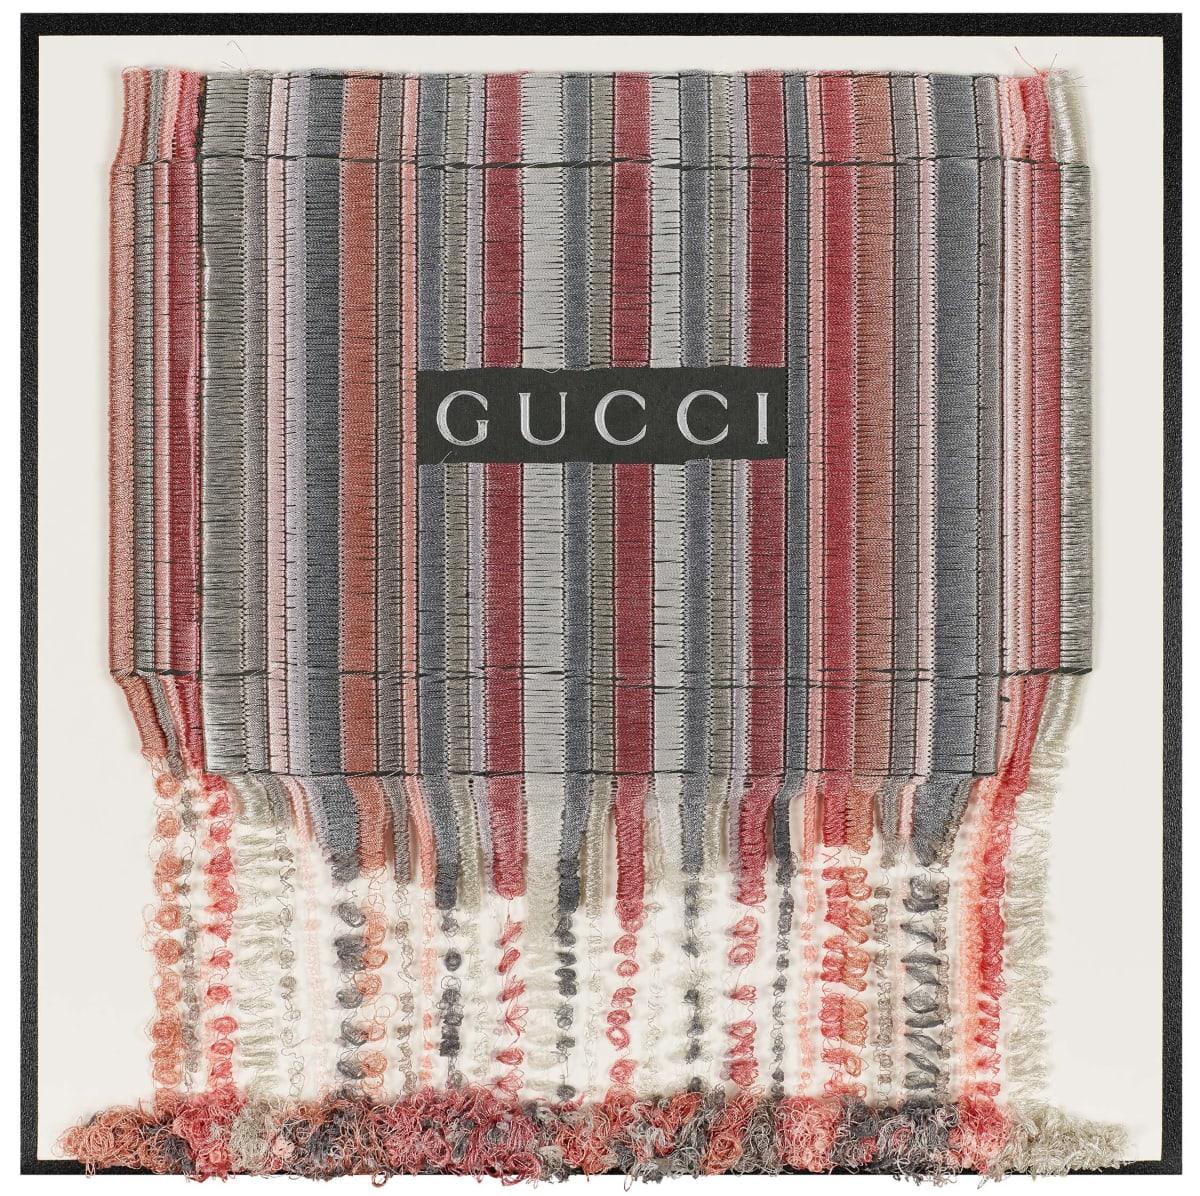 Stephen Wilson, Gucci Blush Drip, 2019